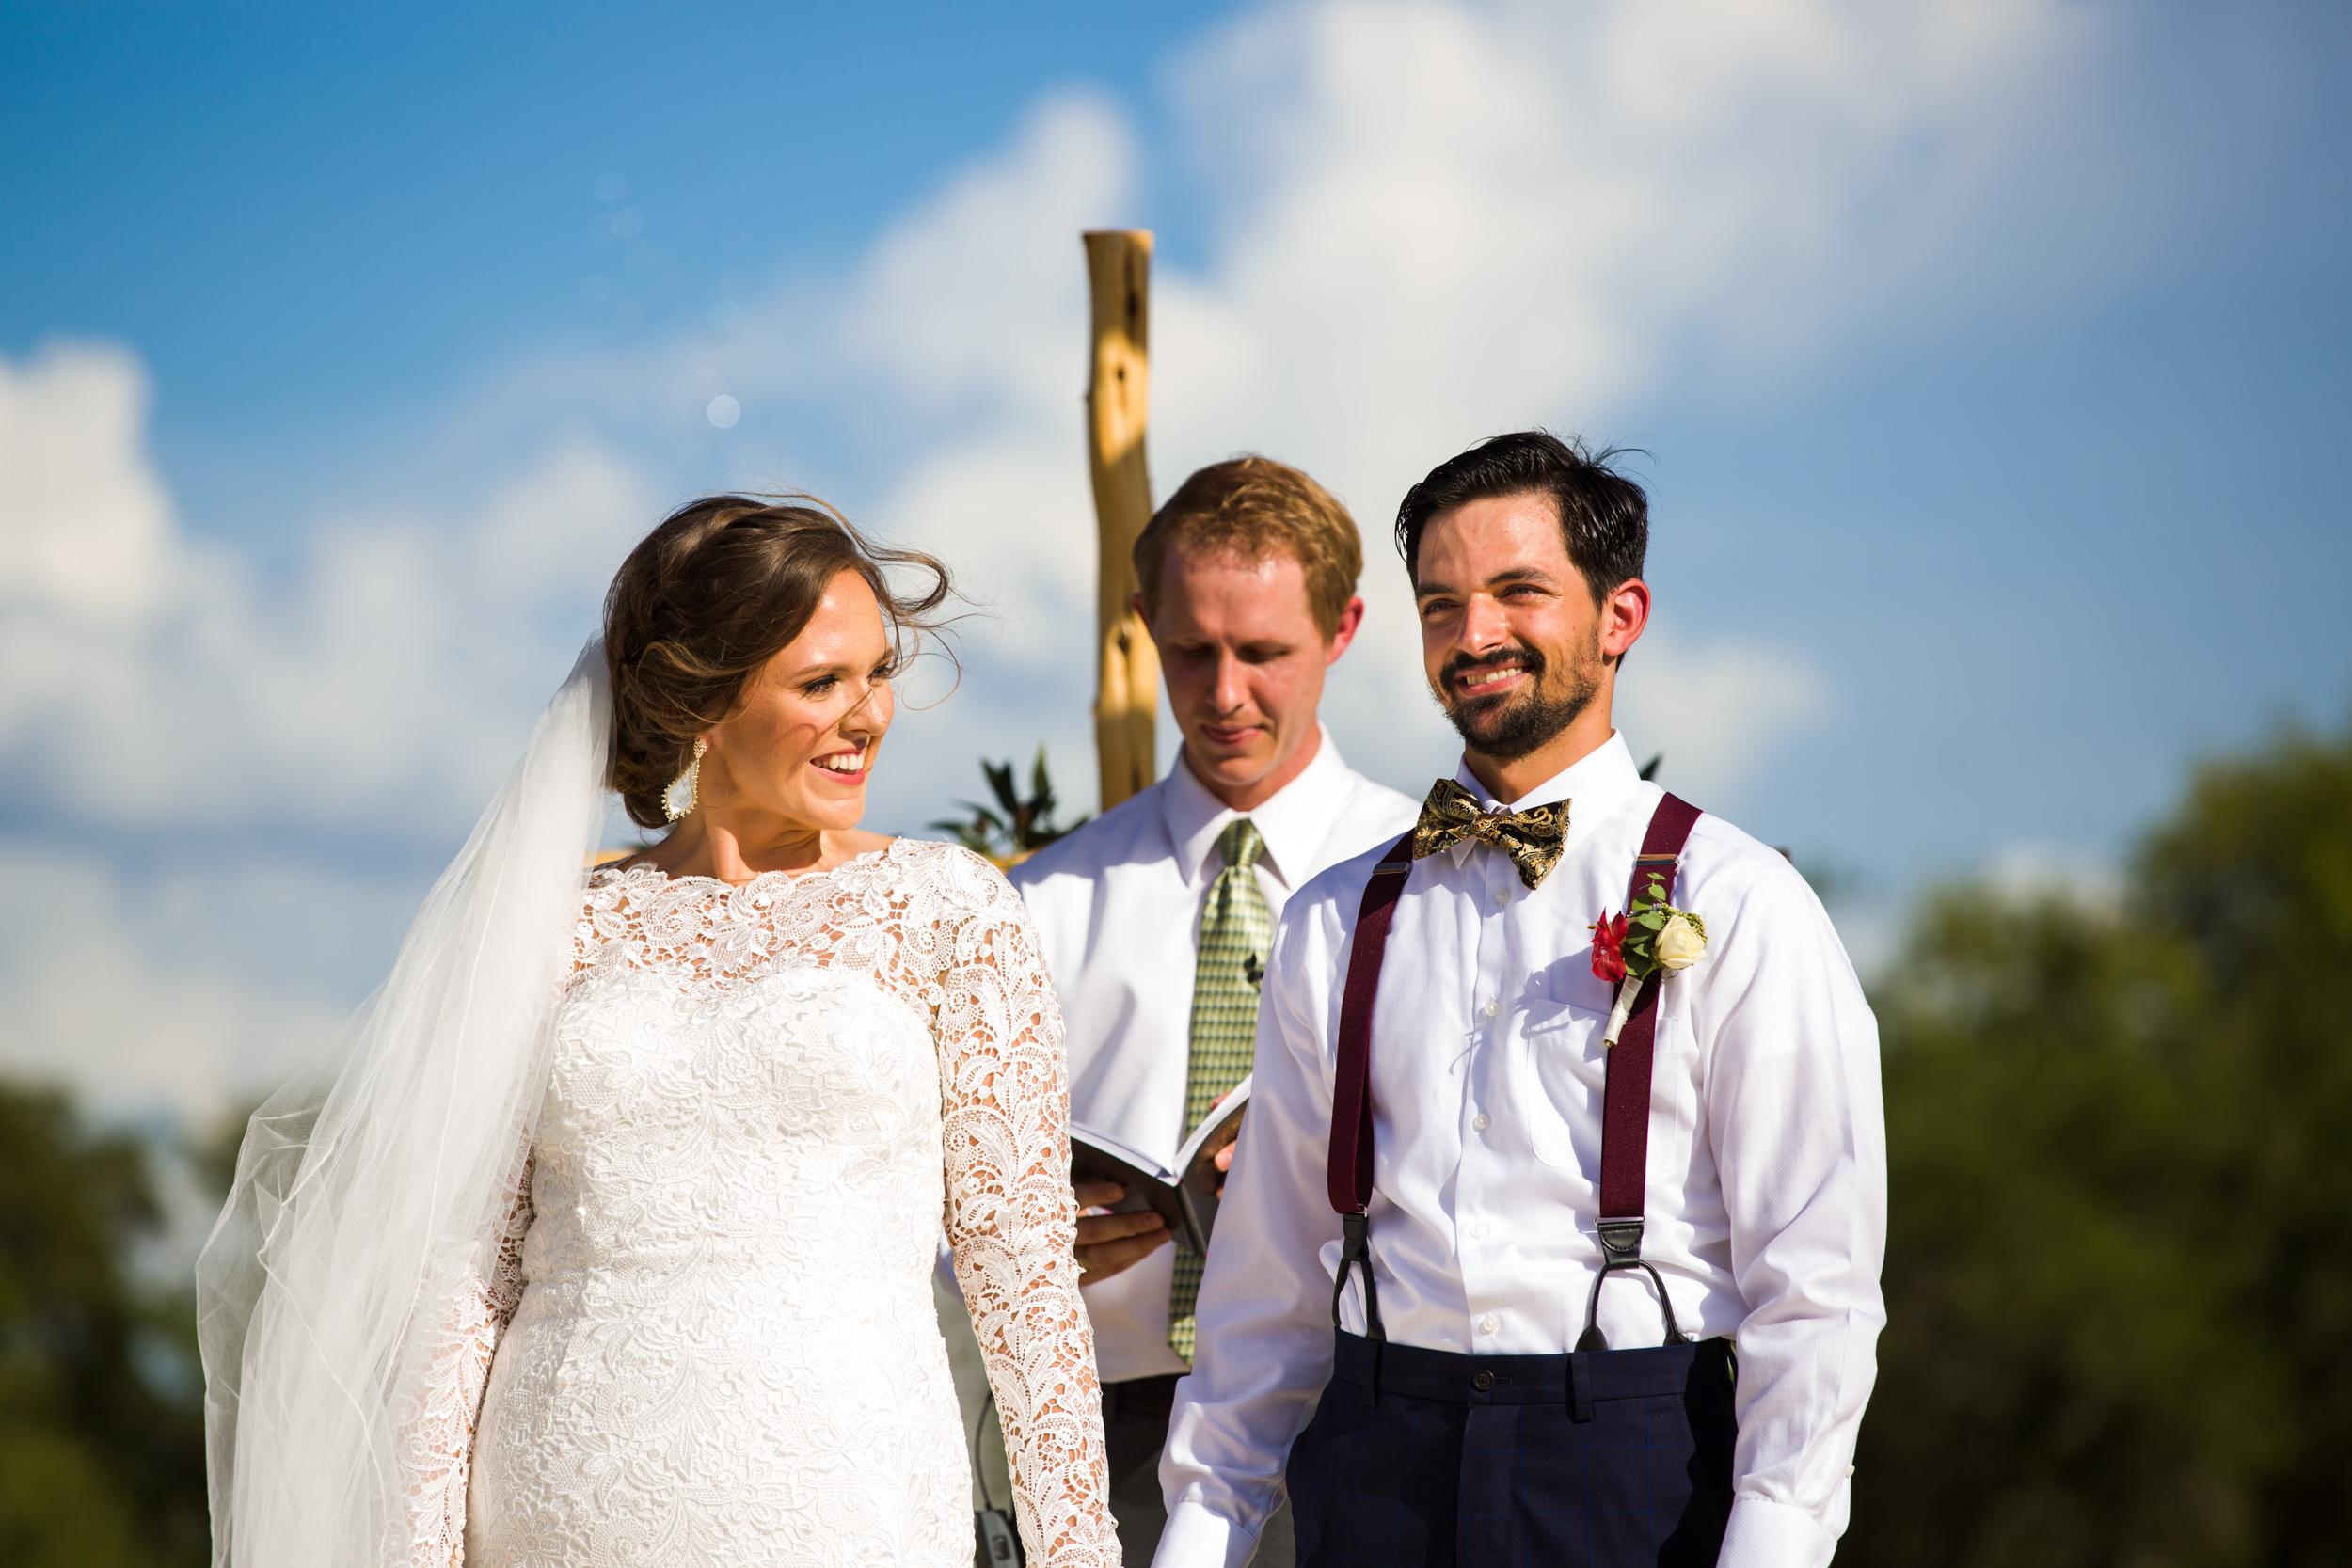 austin-wedding-colorful-29.jpg